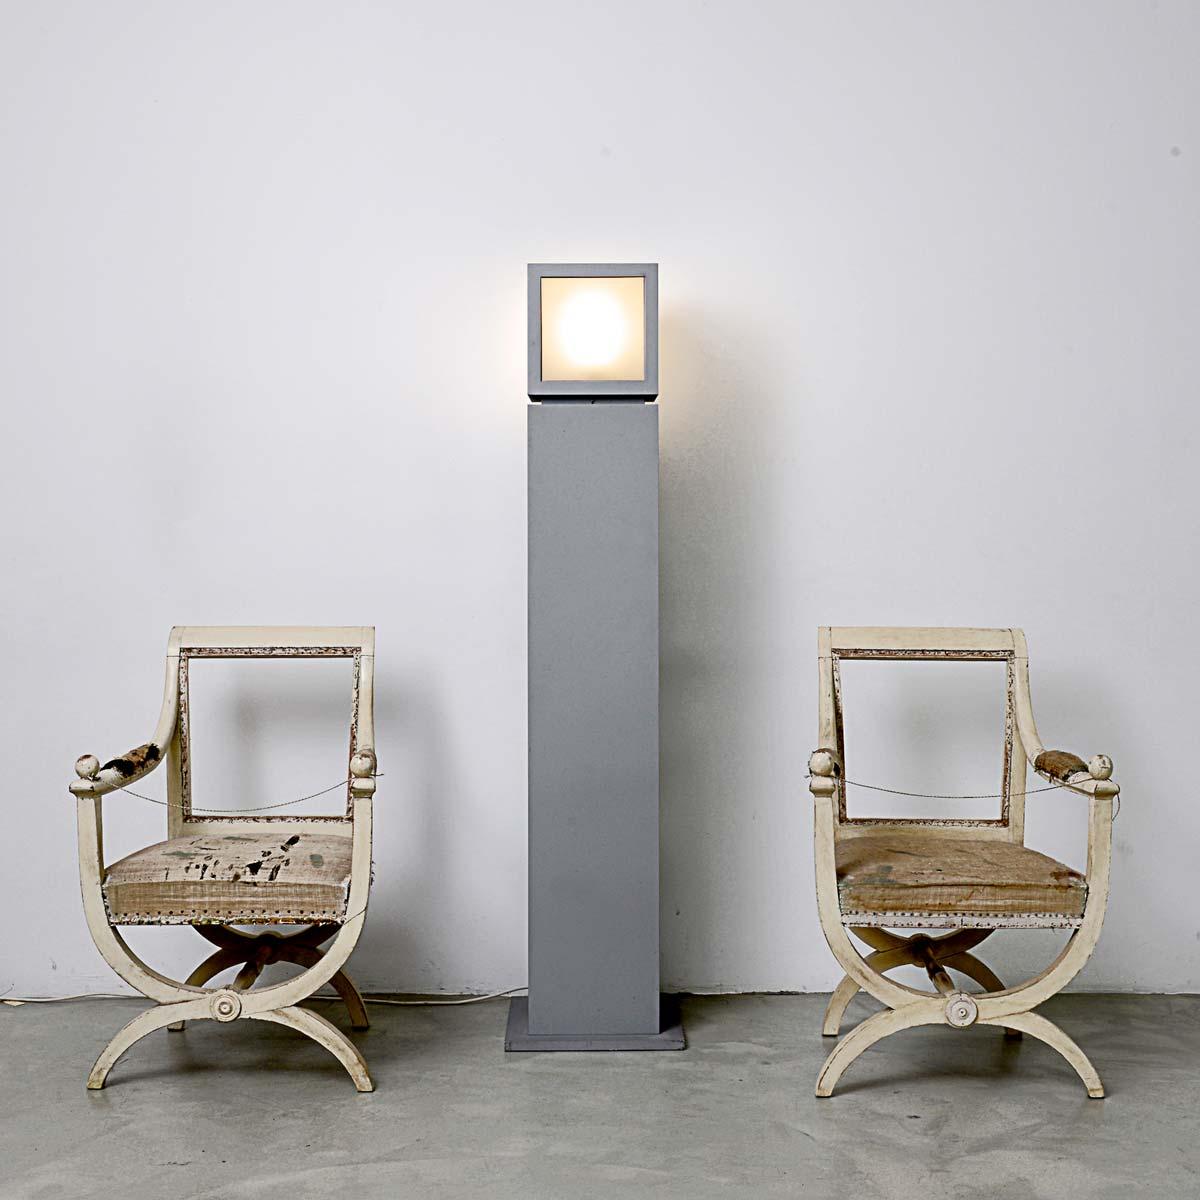 Directoire-Frankreich-um-1805-Ungers-Lampe